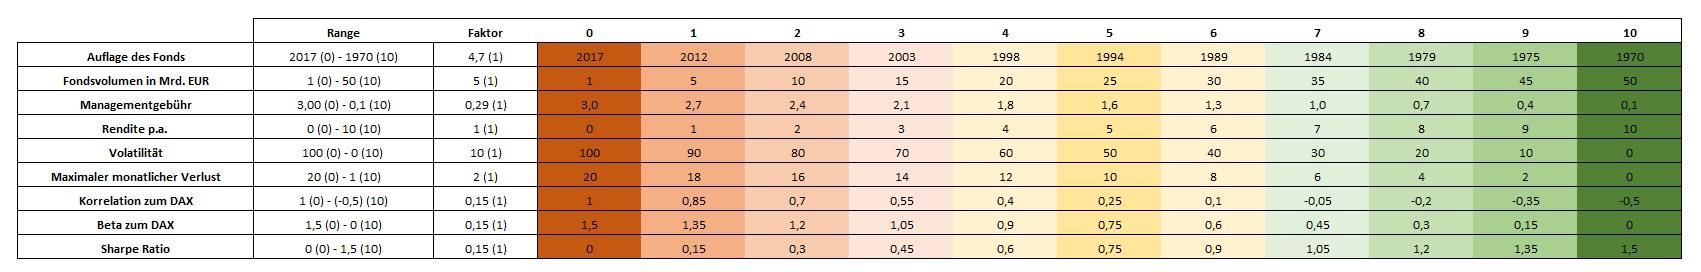 DAX-ETF-verliert-in-diesem-Fonds-Ranking-Kommentar-Jakob-Penndorf-GodmodeTrader.de-2